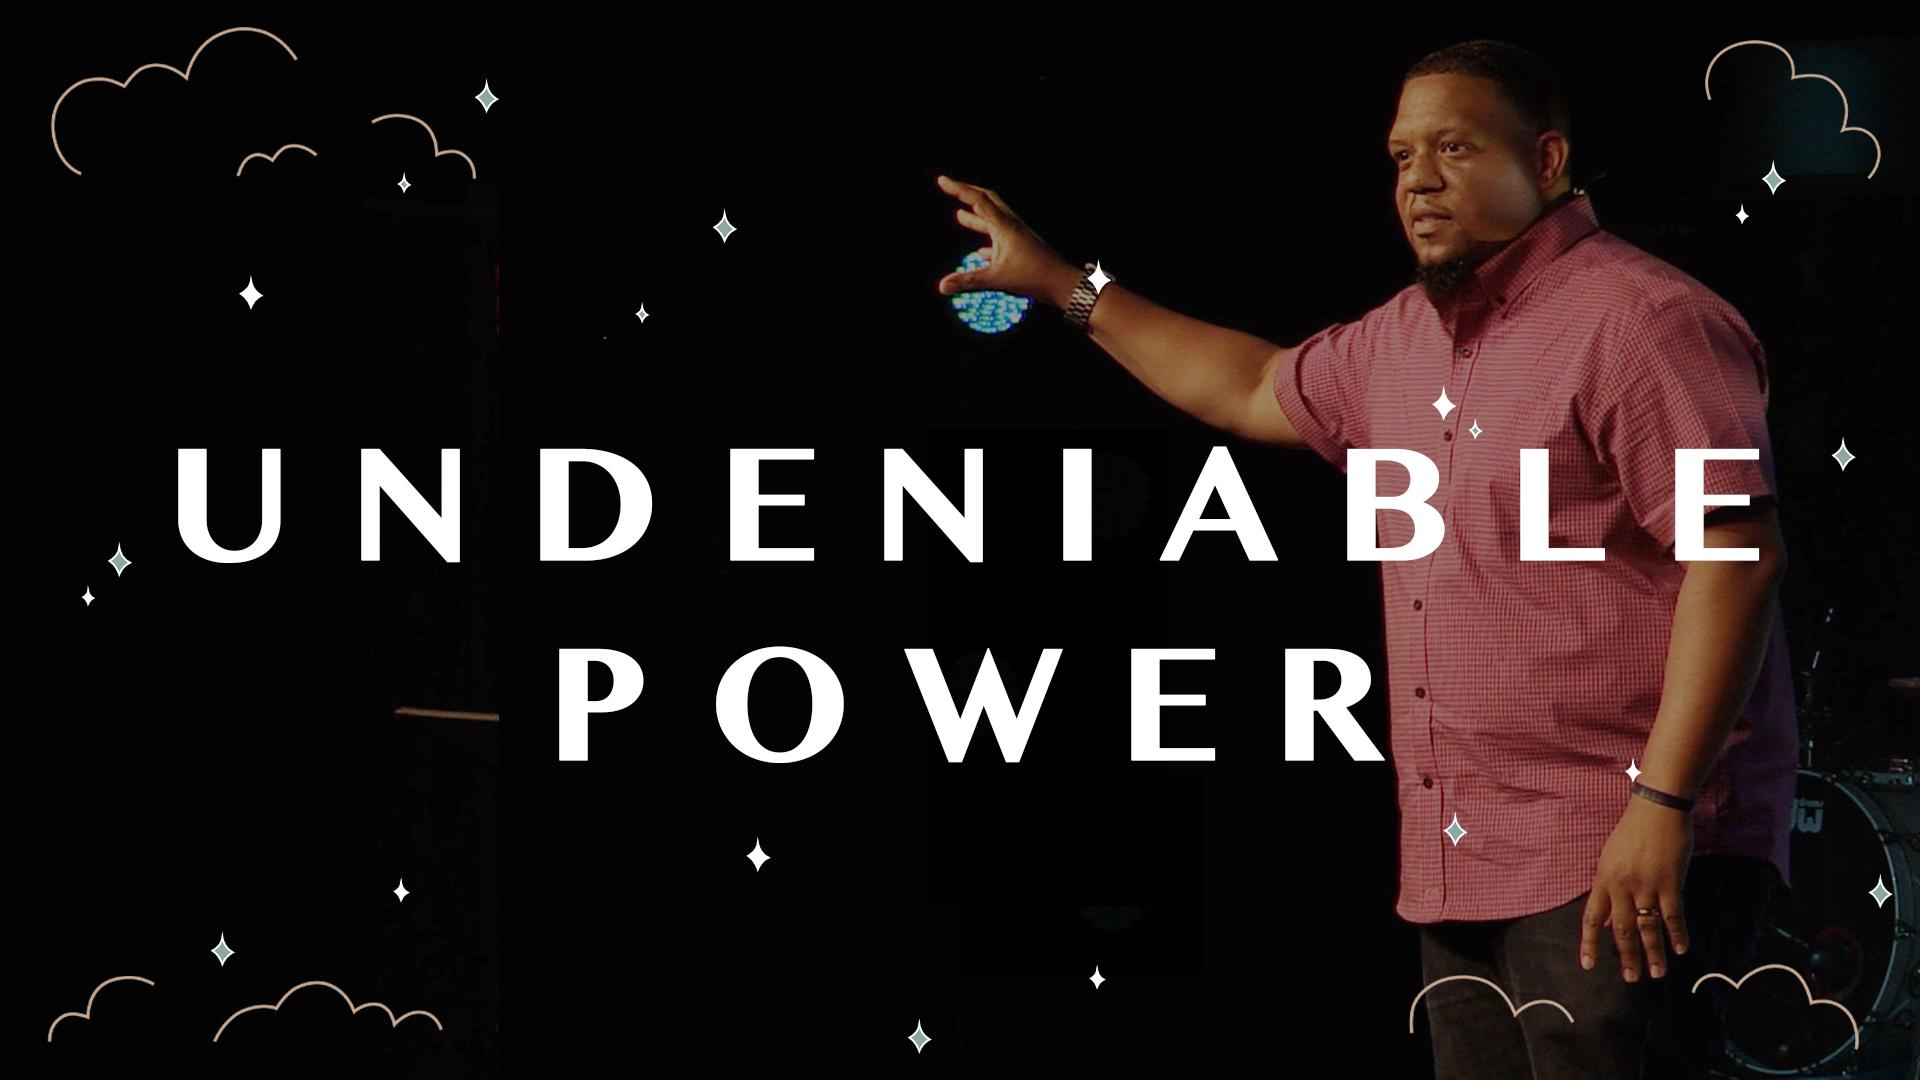 Undeniable Power